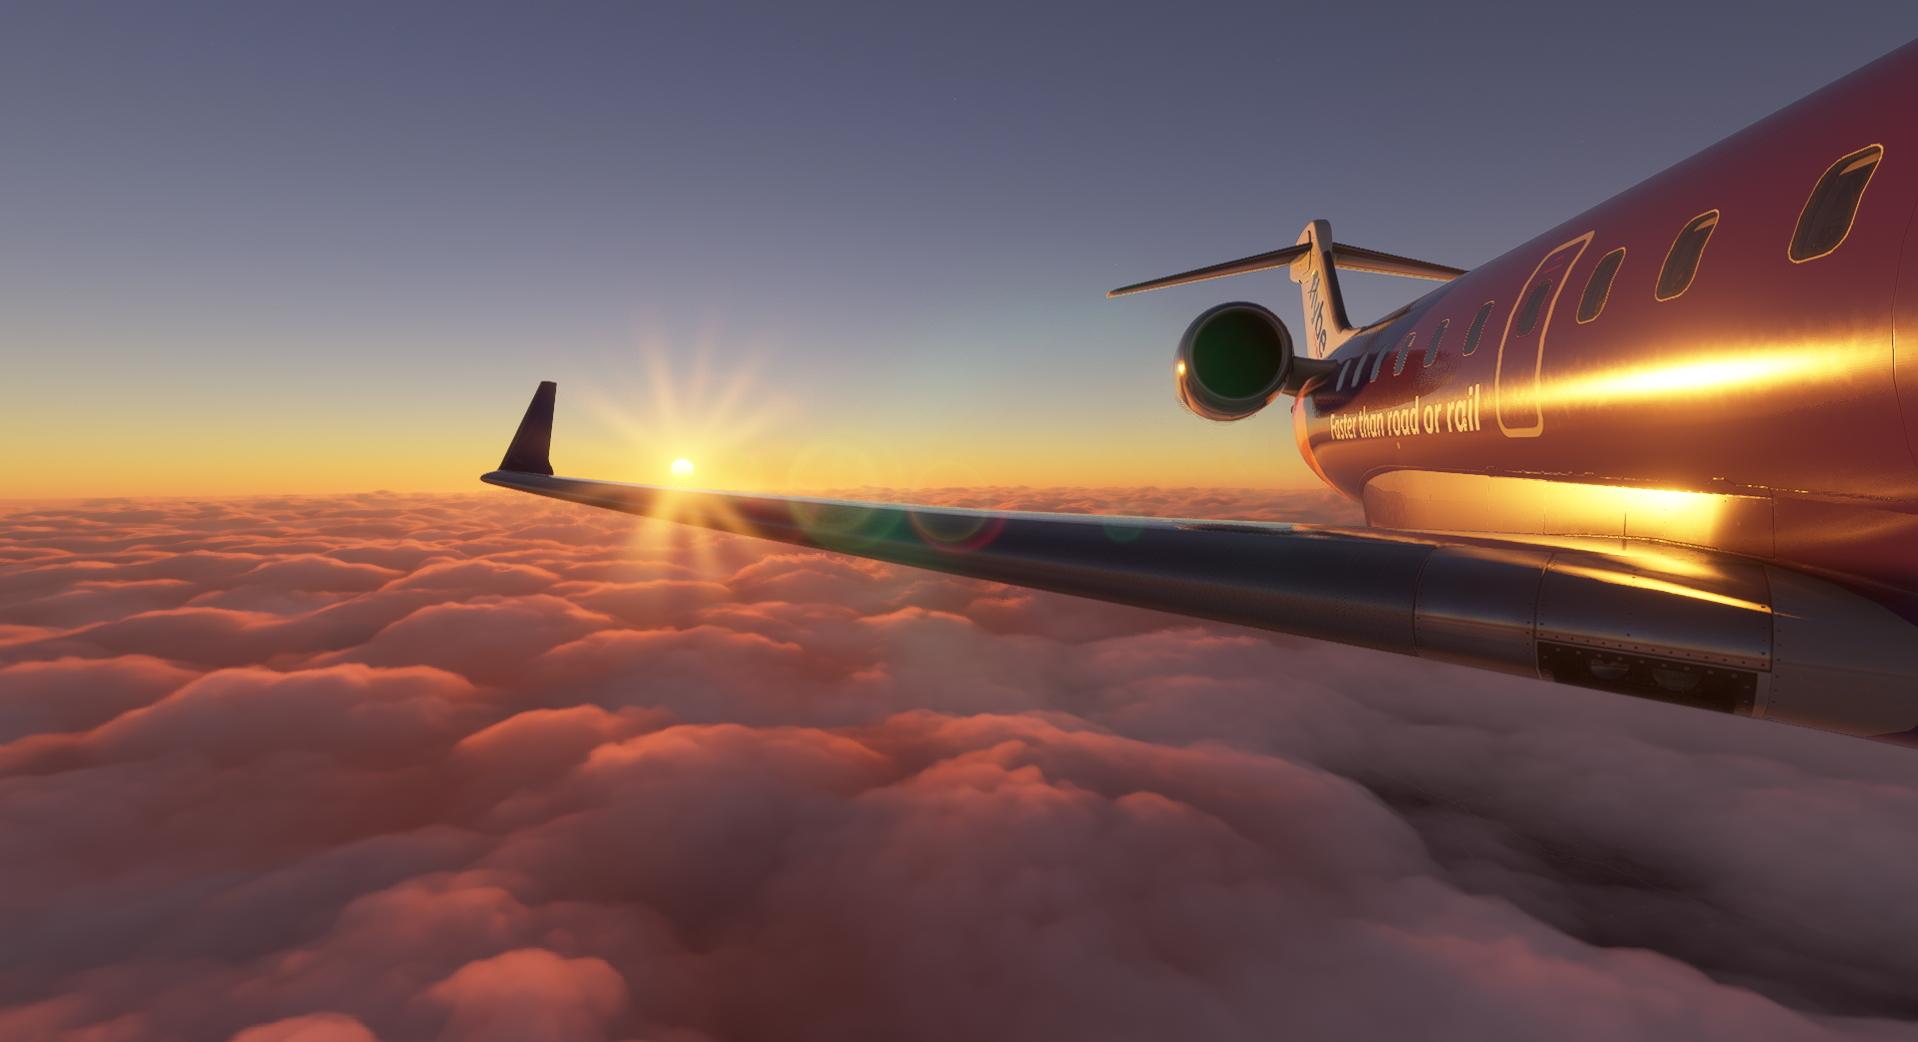 Microsoft Flight Simulator Aerosoft Crj 550 700 Wing Rear